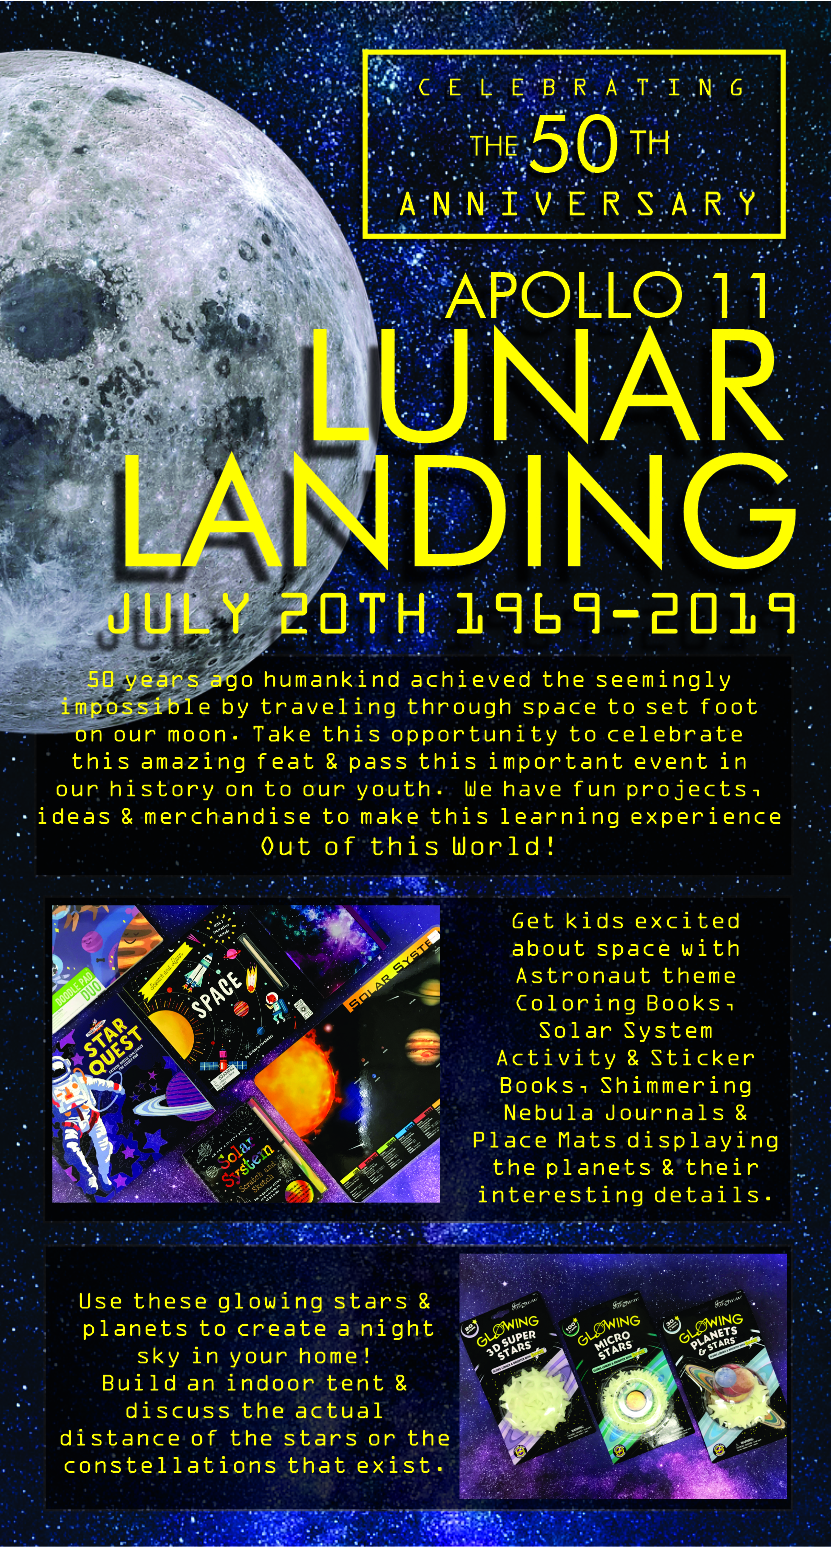 Lunar Landing ad p1.jpg